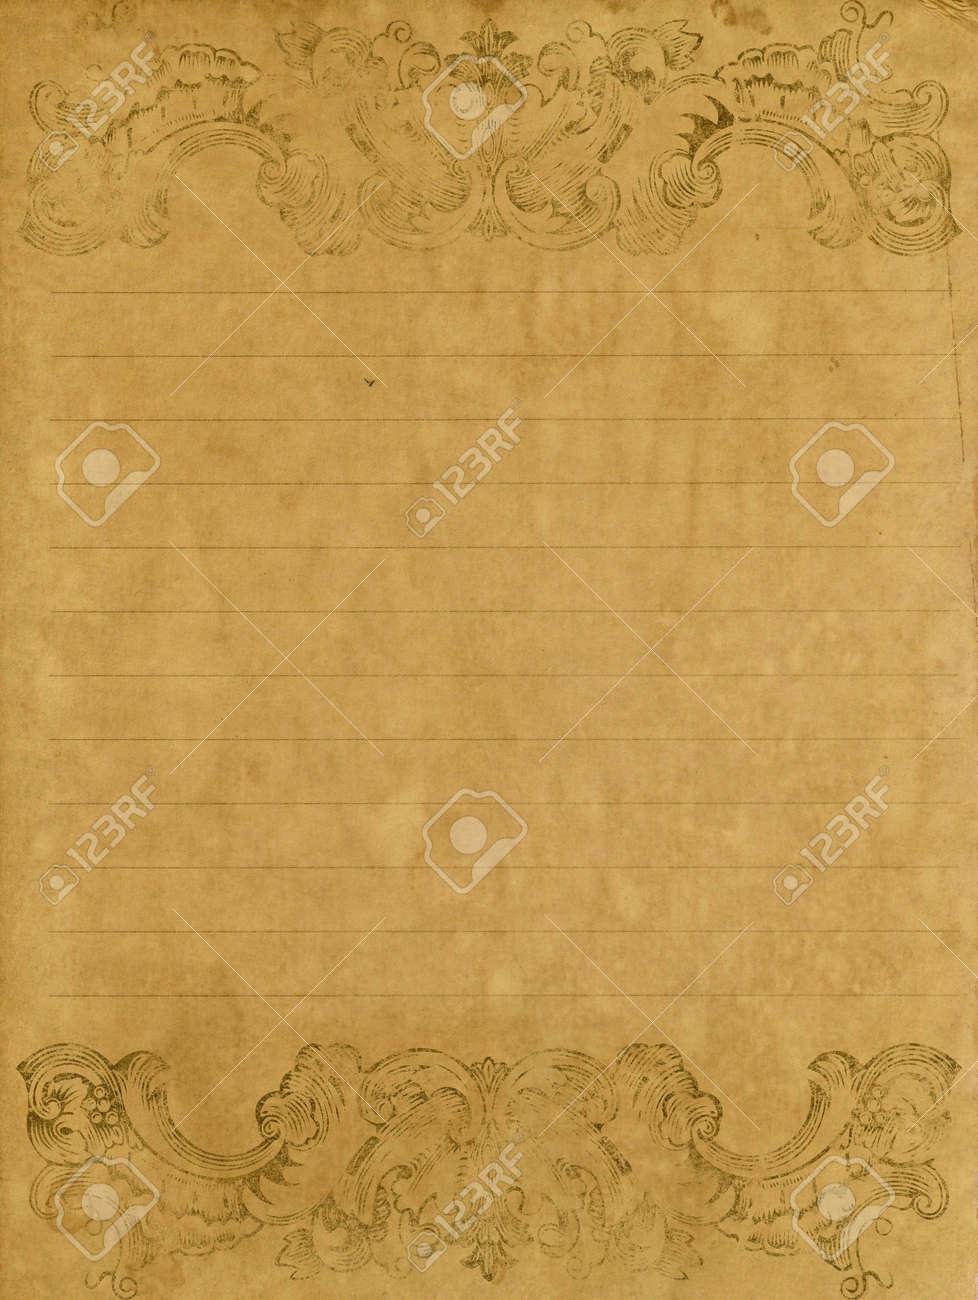 Old grunge letter paper with vintage victorian style stock photo old grunge letter paper with vintage victorian style stock photo 11809790 altavistaventures Images